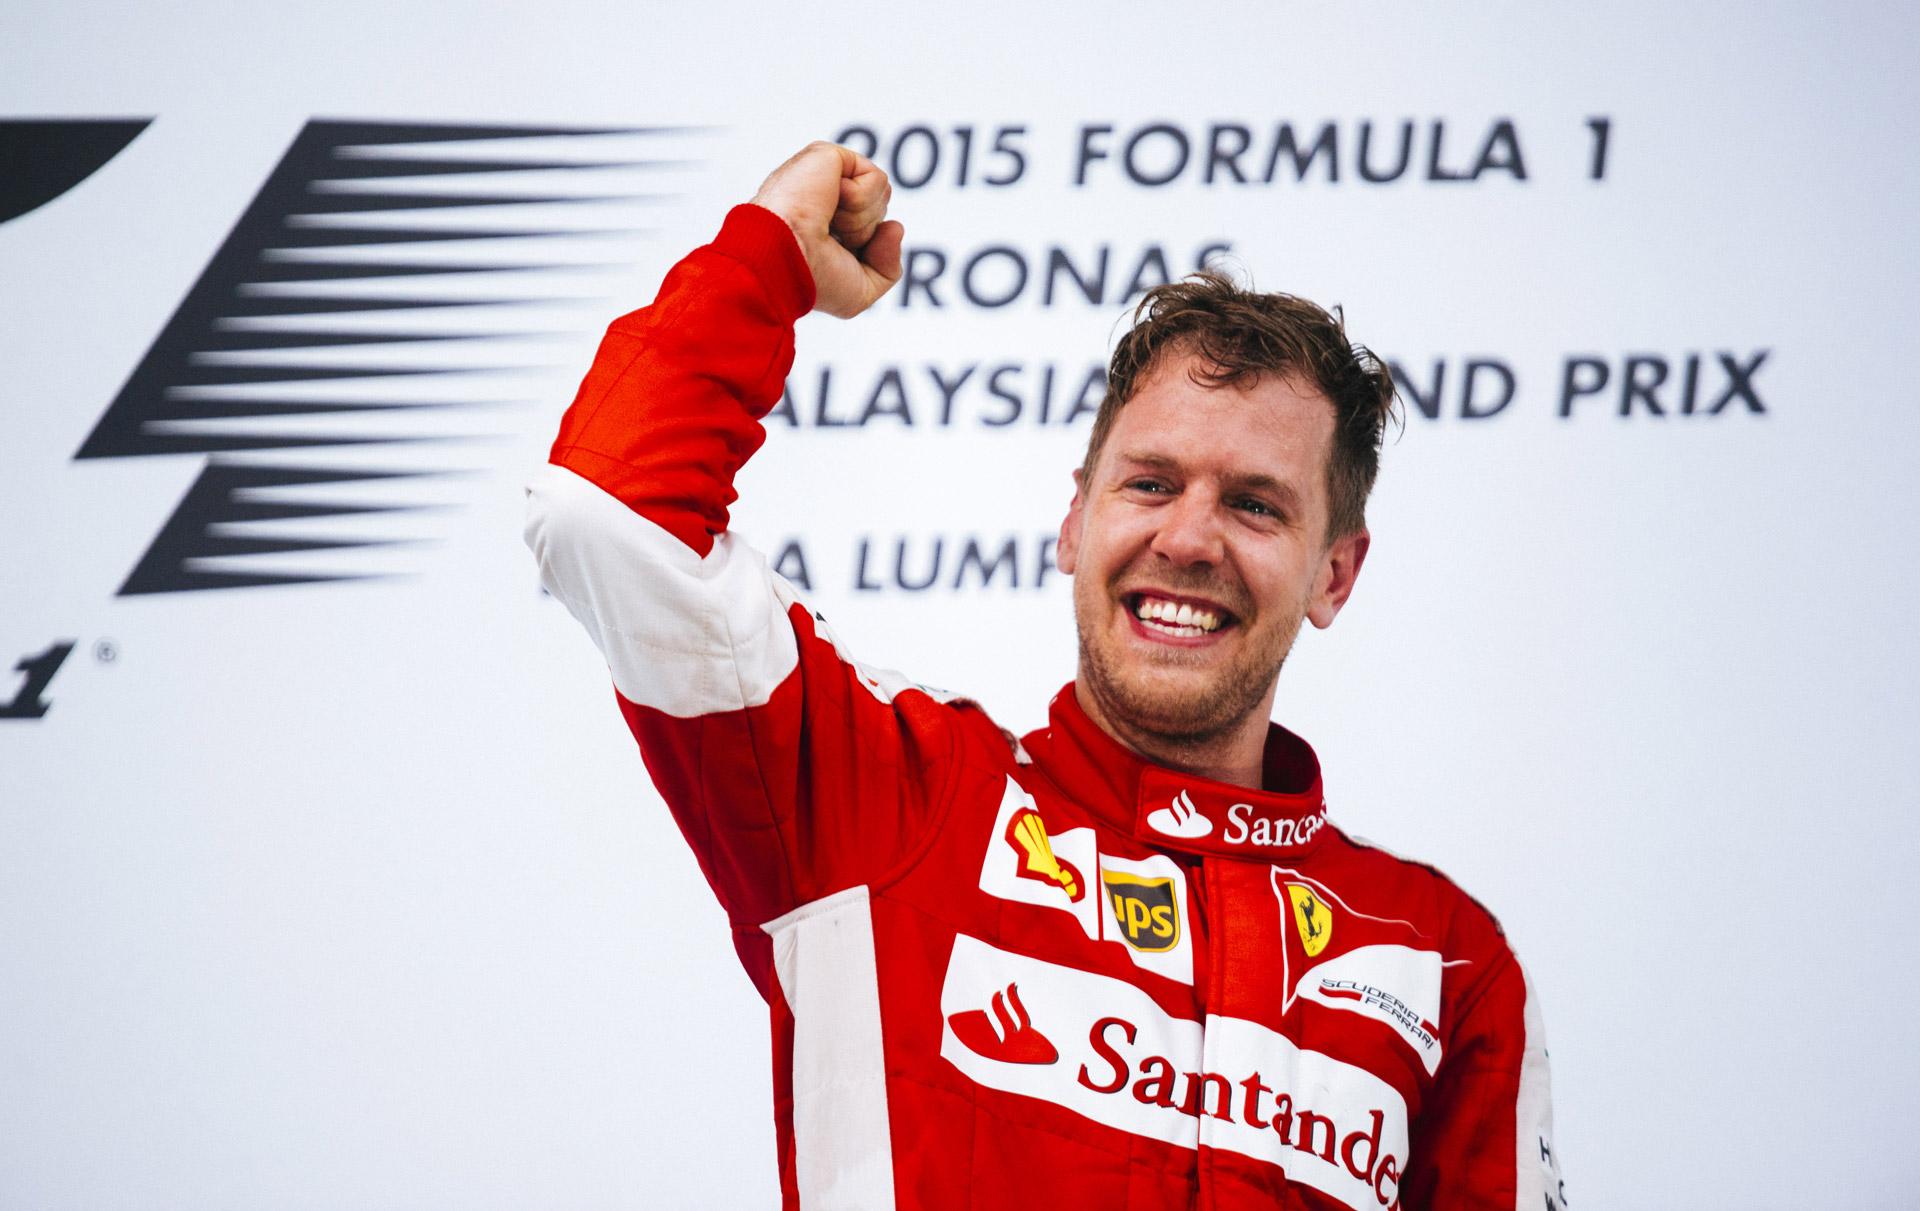 Sebastian Vettel Secures Ferrari's First F1 Win Since 2013 ...